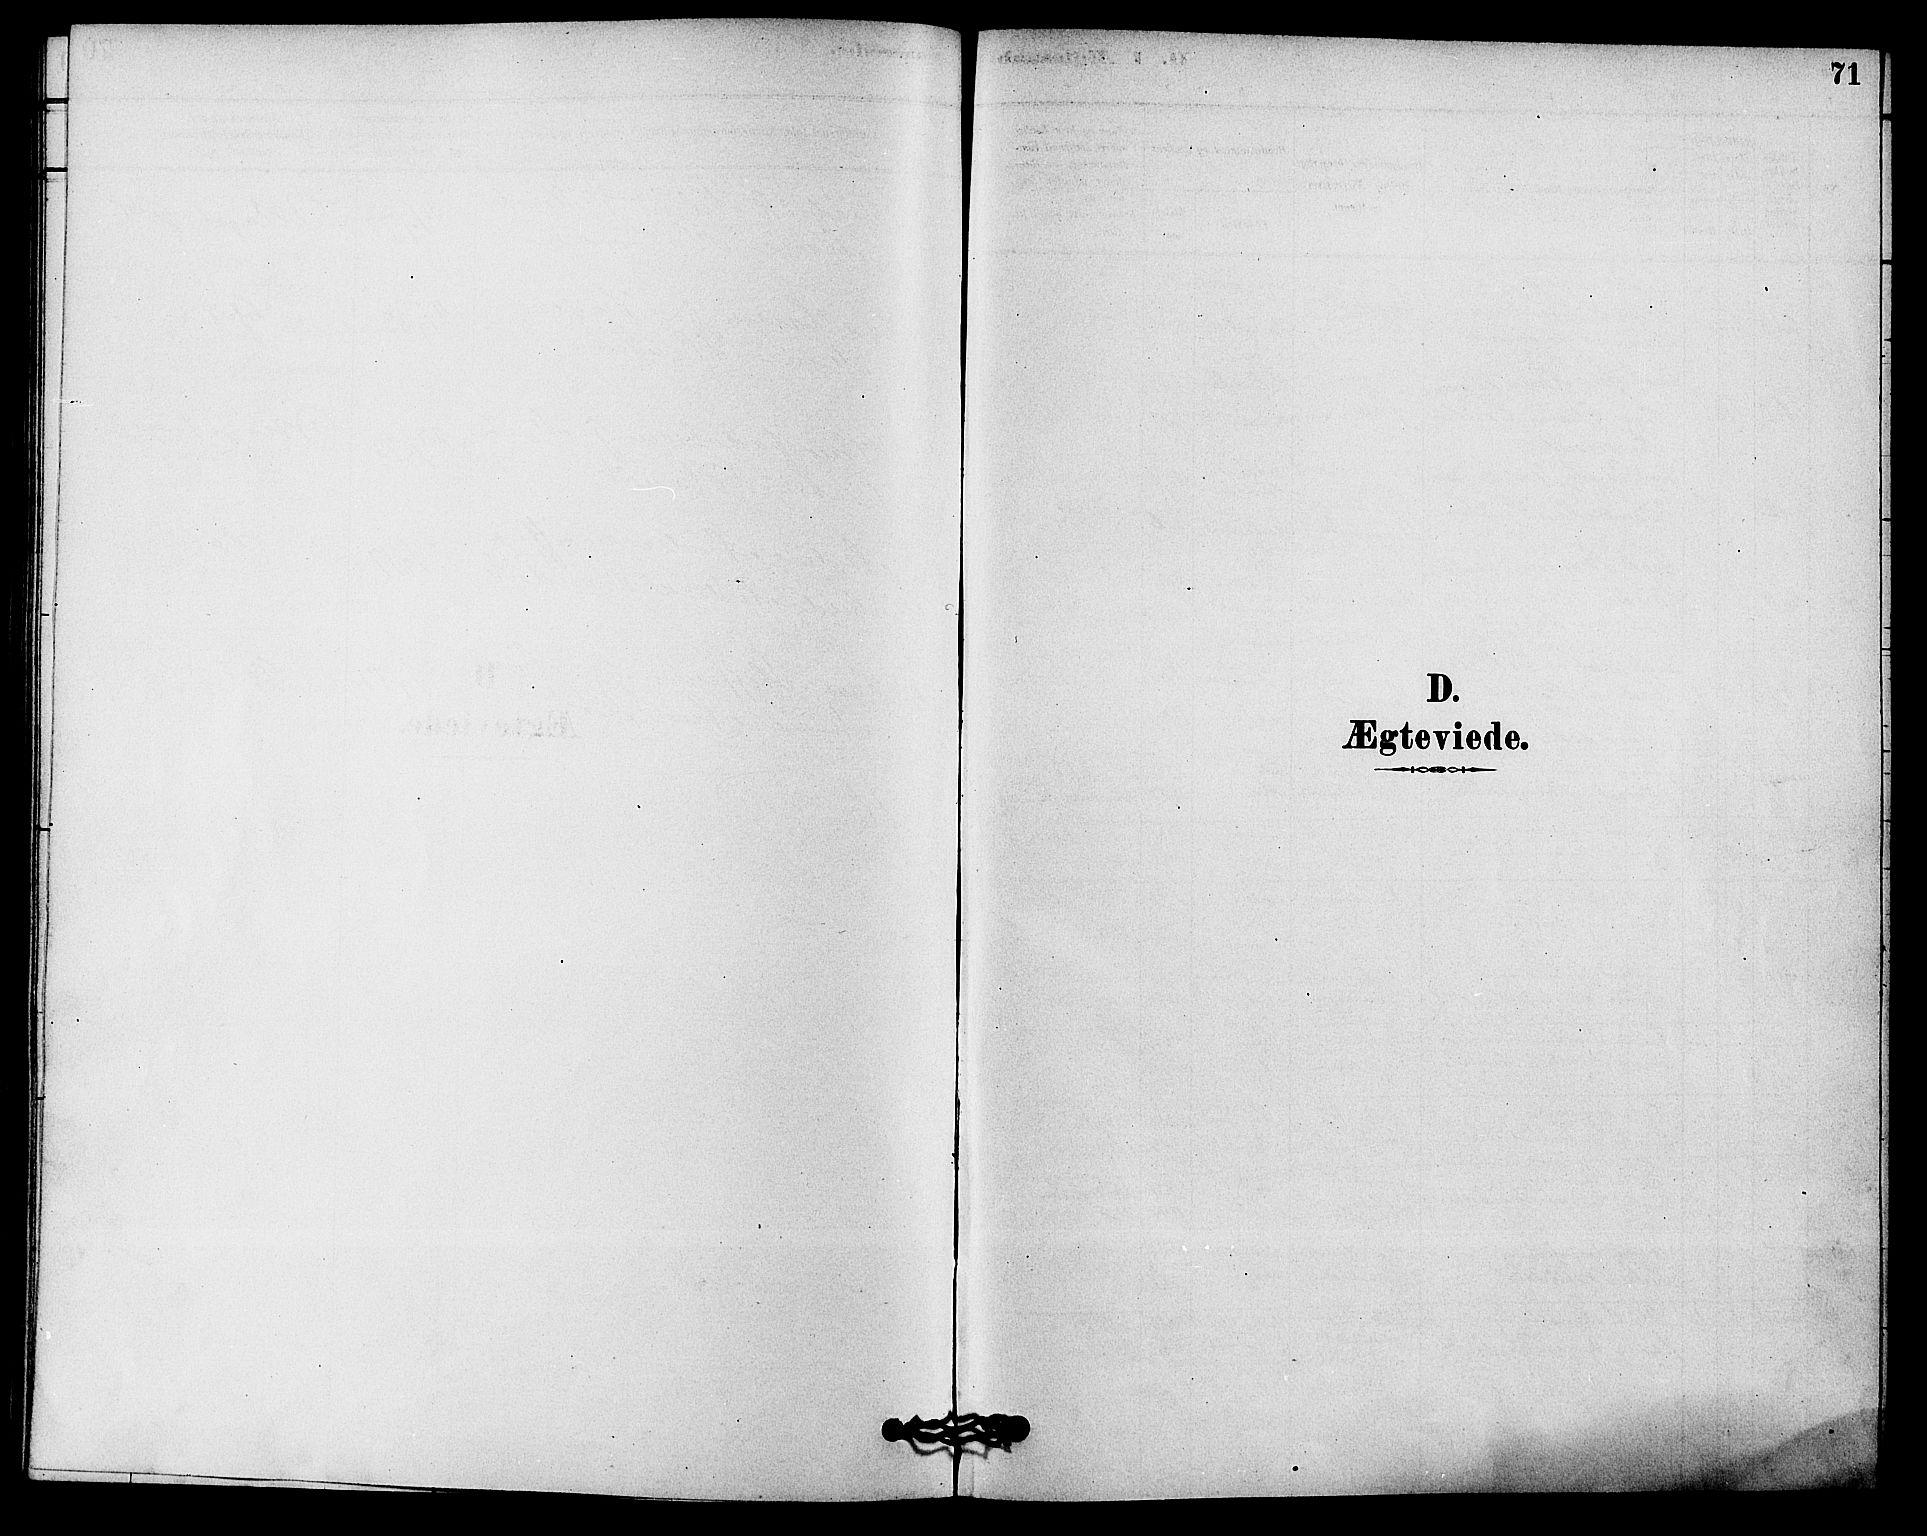 SAKO, Solum kirkebøker, F/Fc/L0001: Ministerialbok nr. III 1, 1877-1891, s. 71